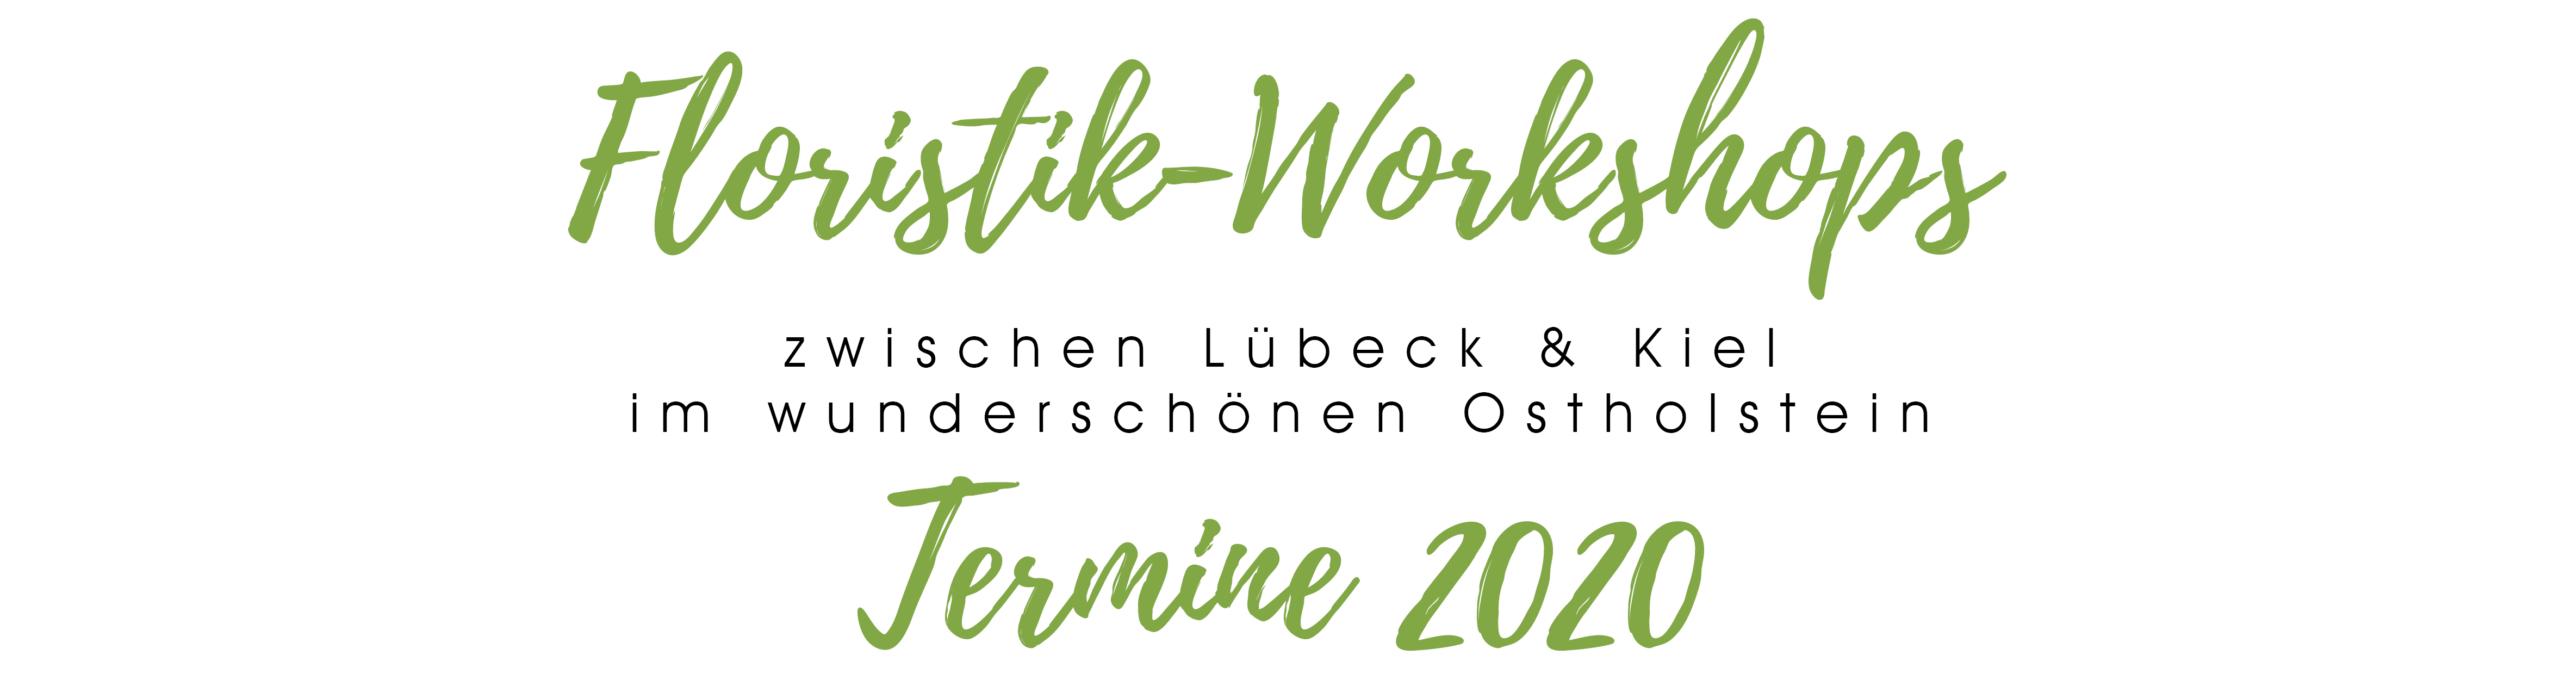 Floristik Workshops in Ostholstein